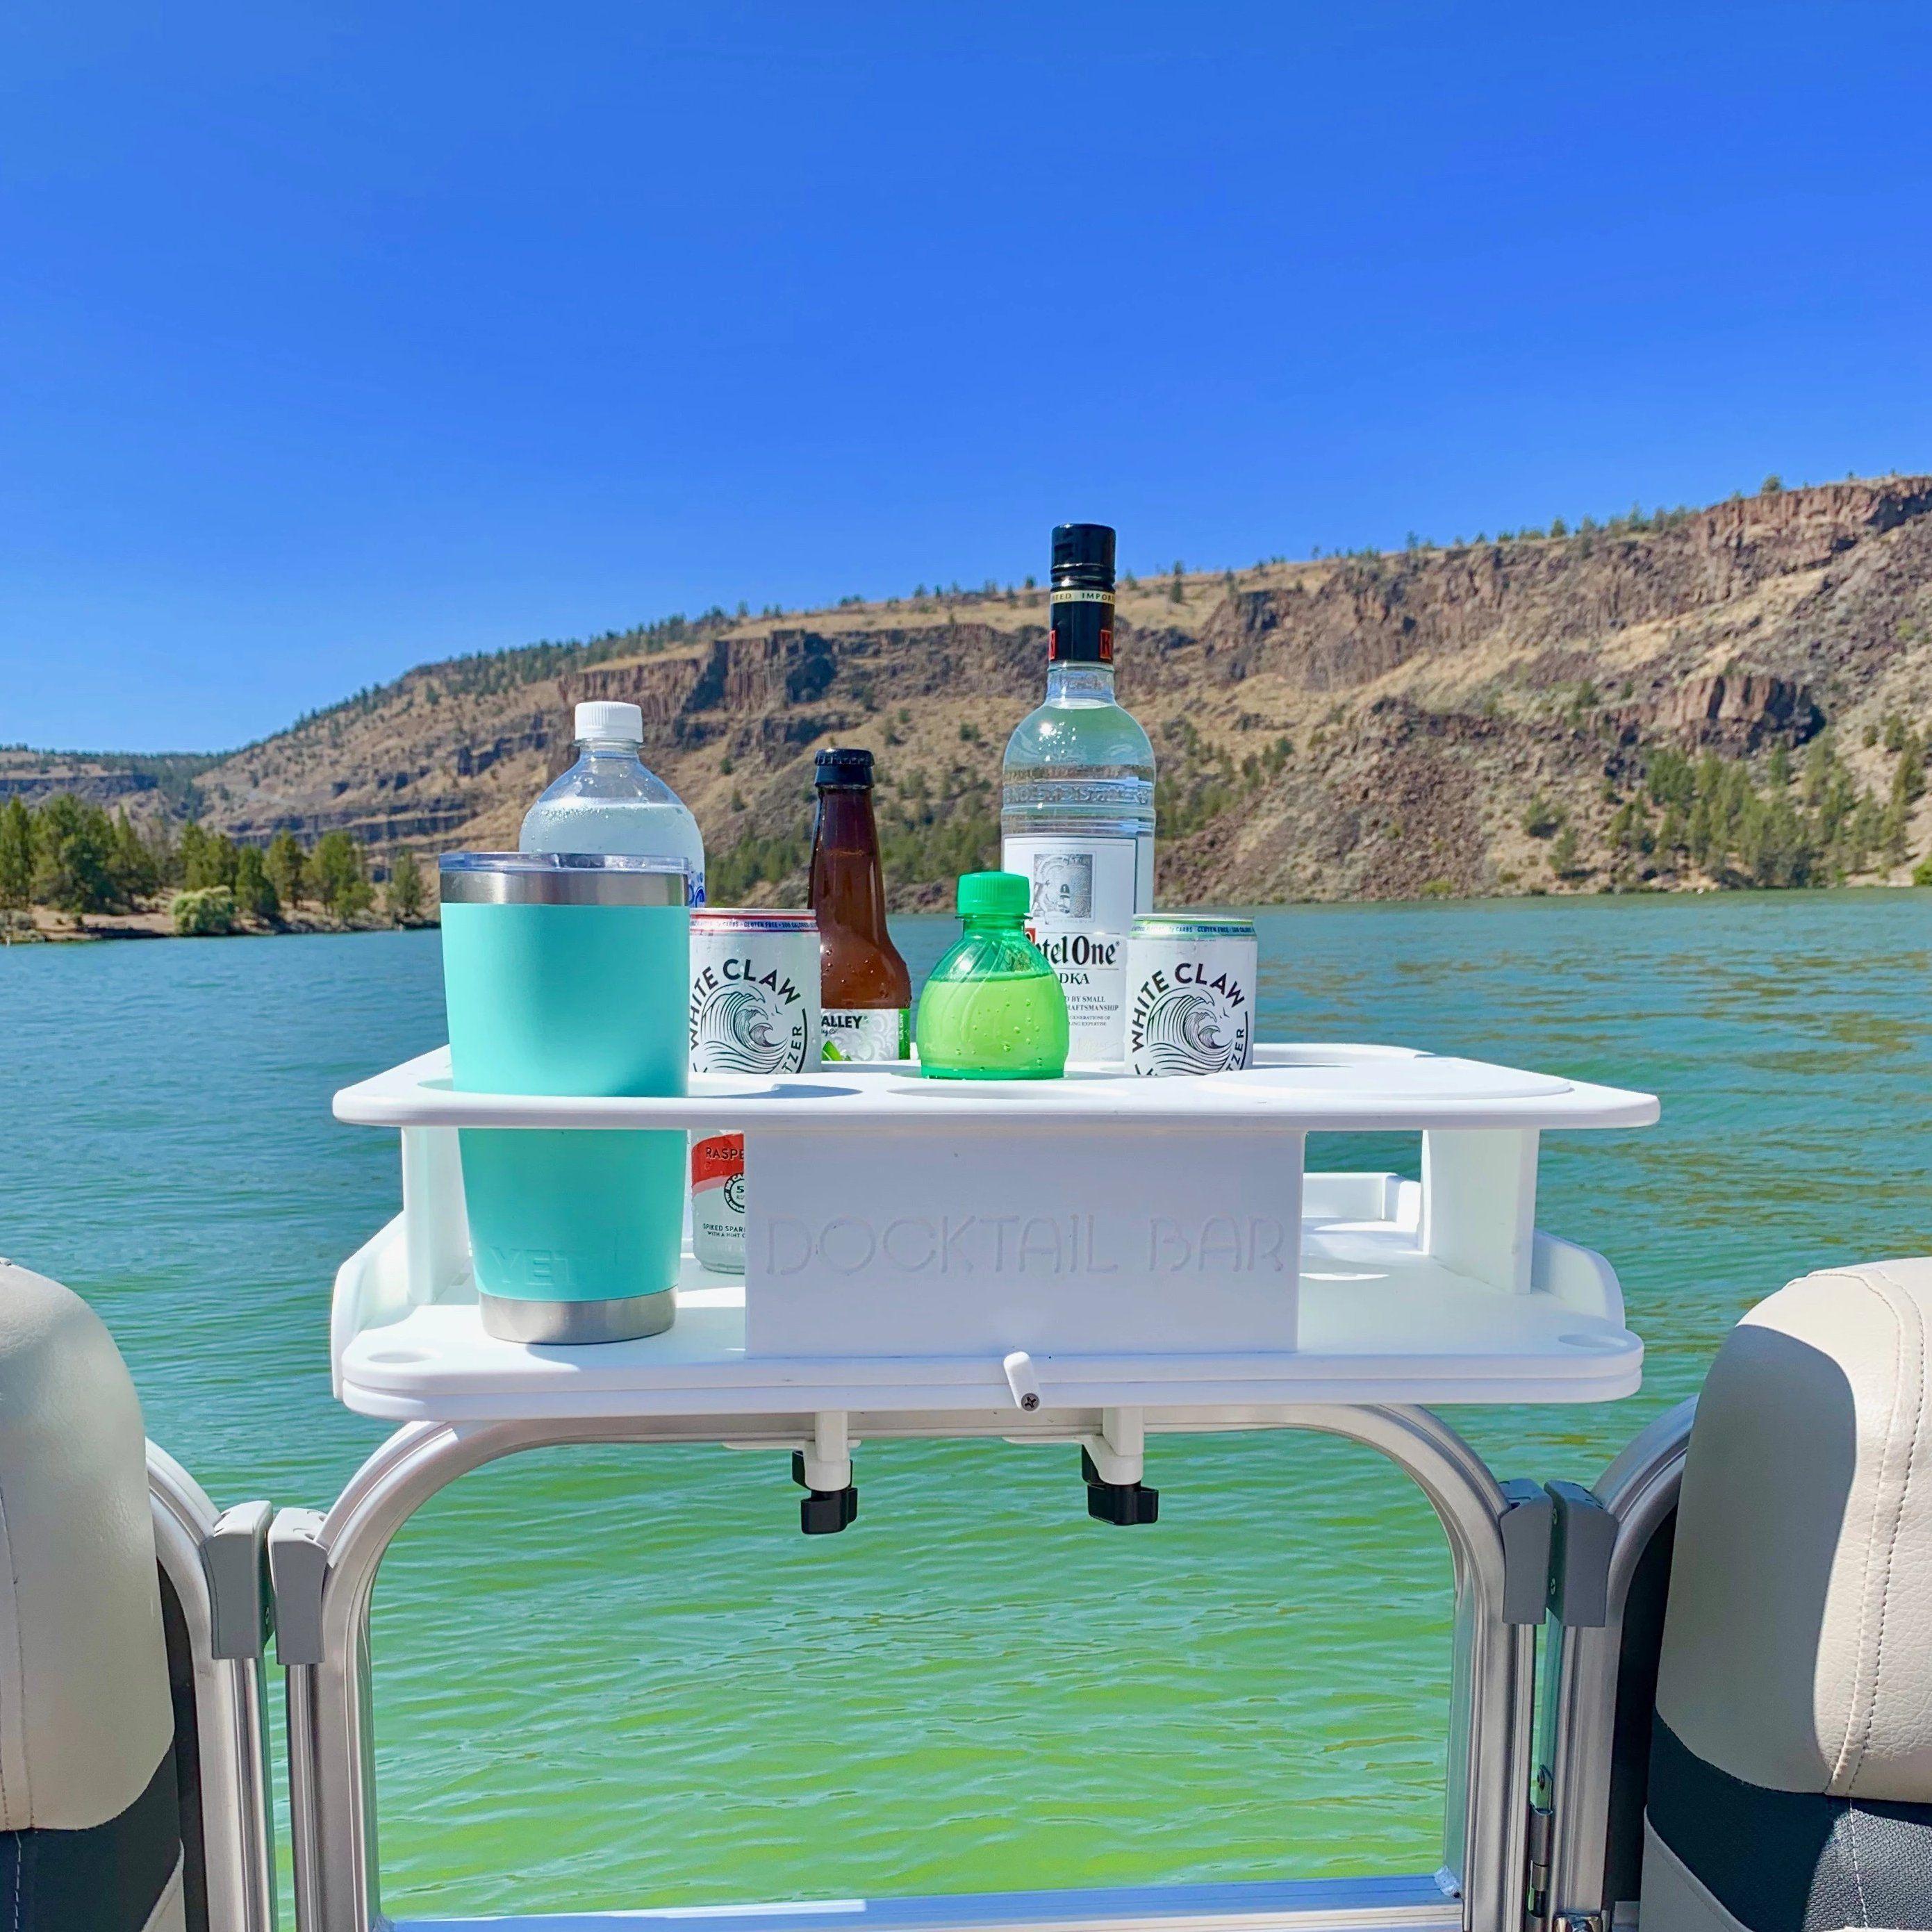 Pin On Boat Food